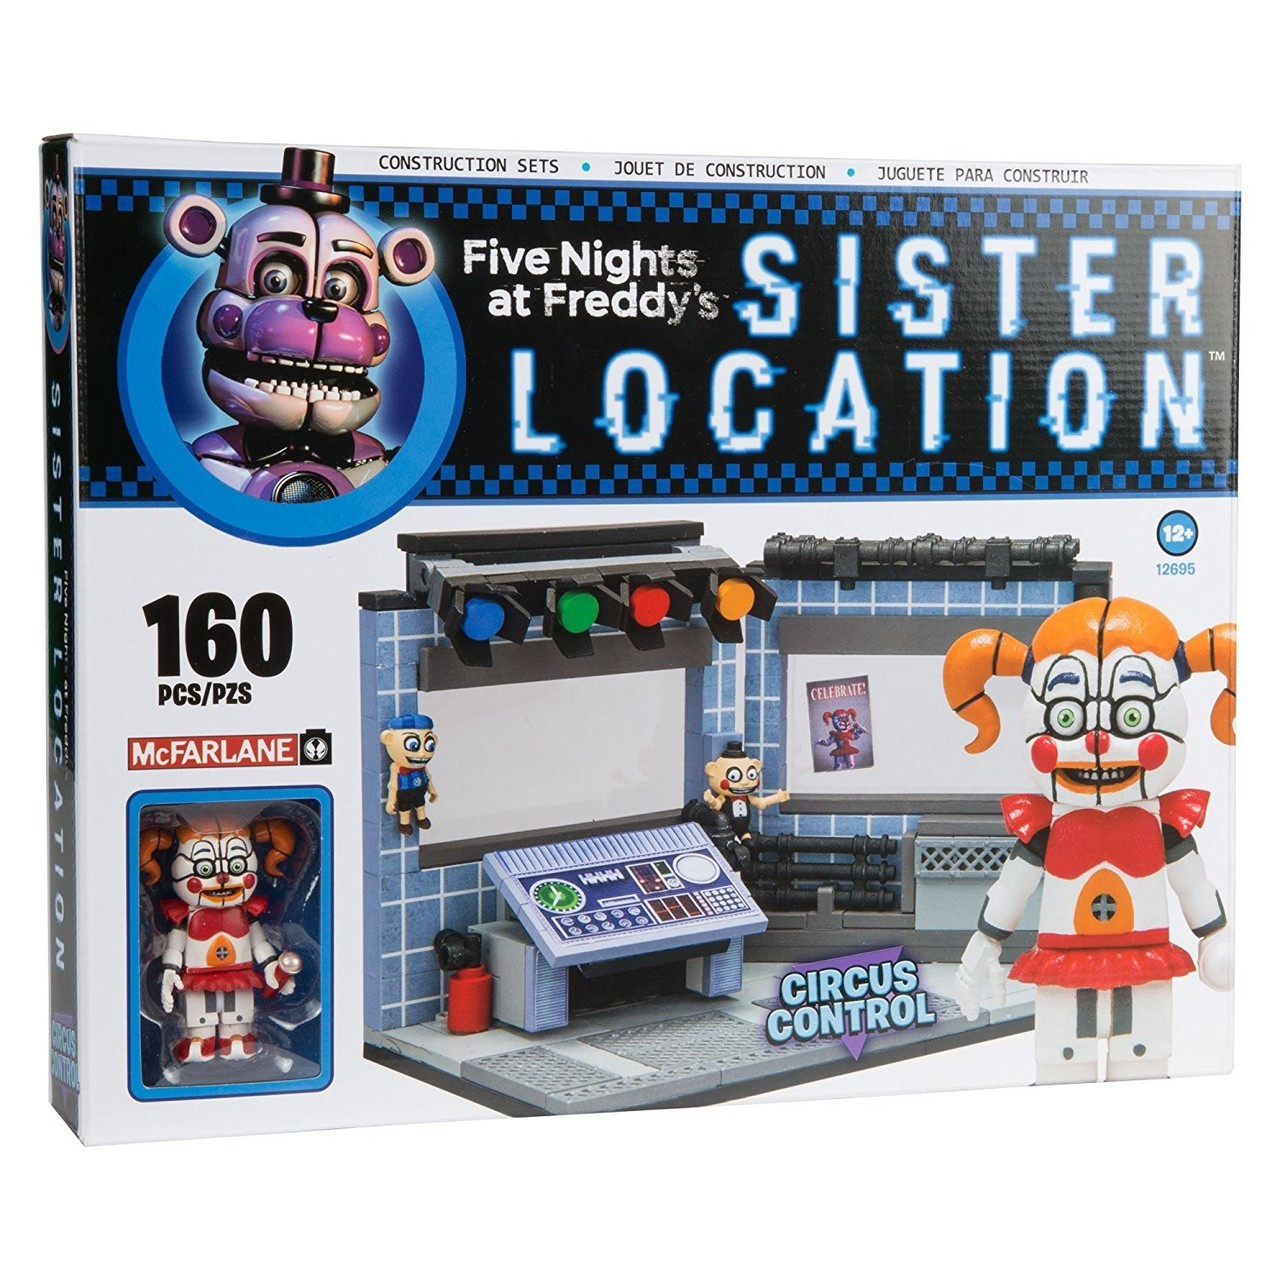 "Five Nights at Freddy's Sister Location Конструктор ""Управление цирком"" 160 деталей"